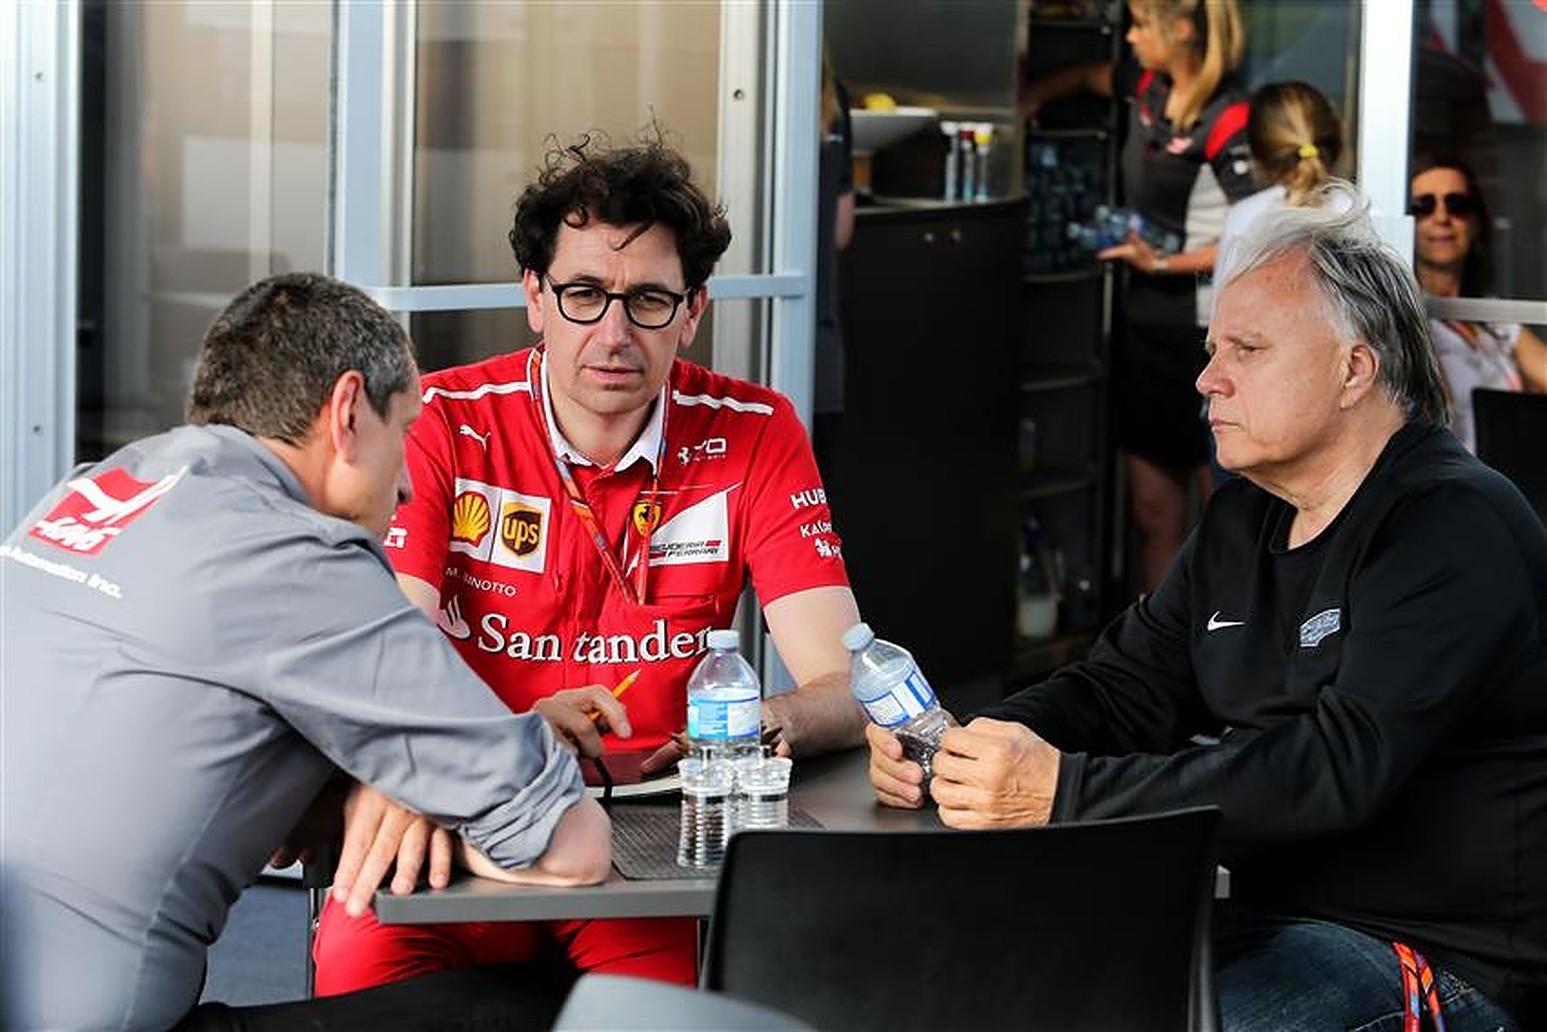 ferrari-and-haas-f1-technical-partnership-binotto-and-steiner-formula1news_co_uk_v1.jpg